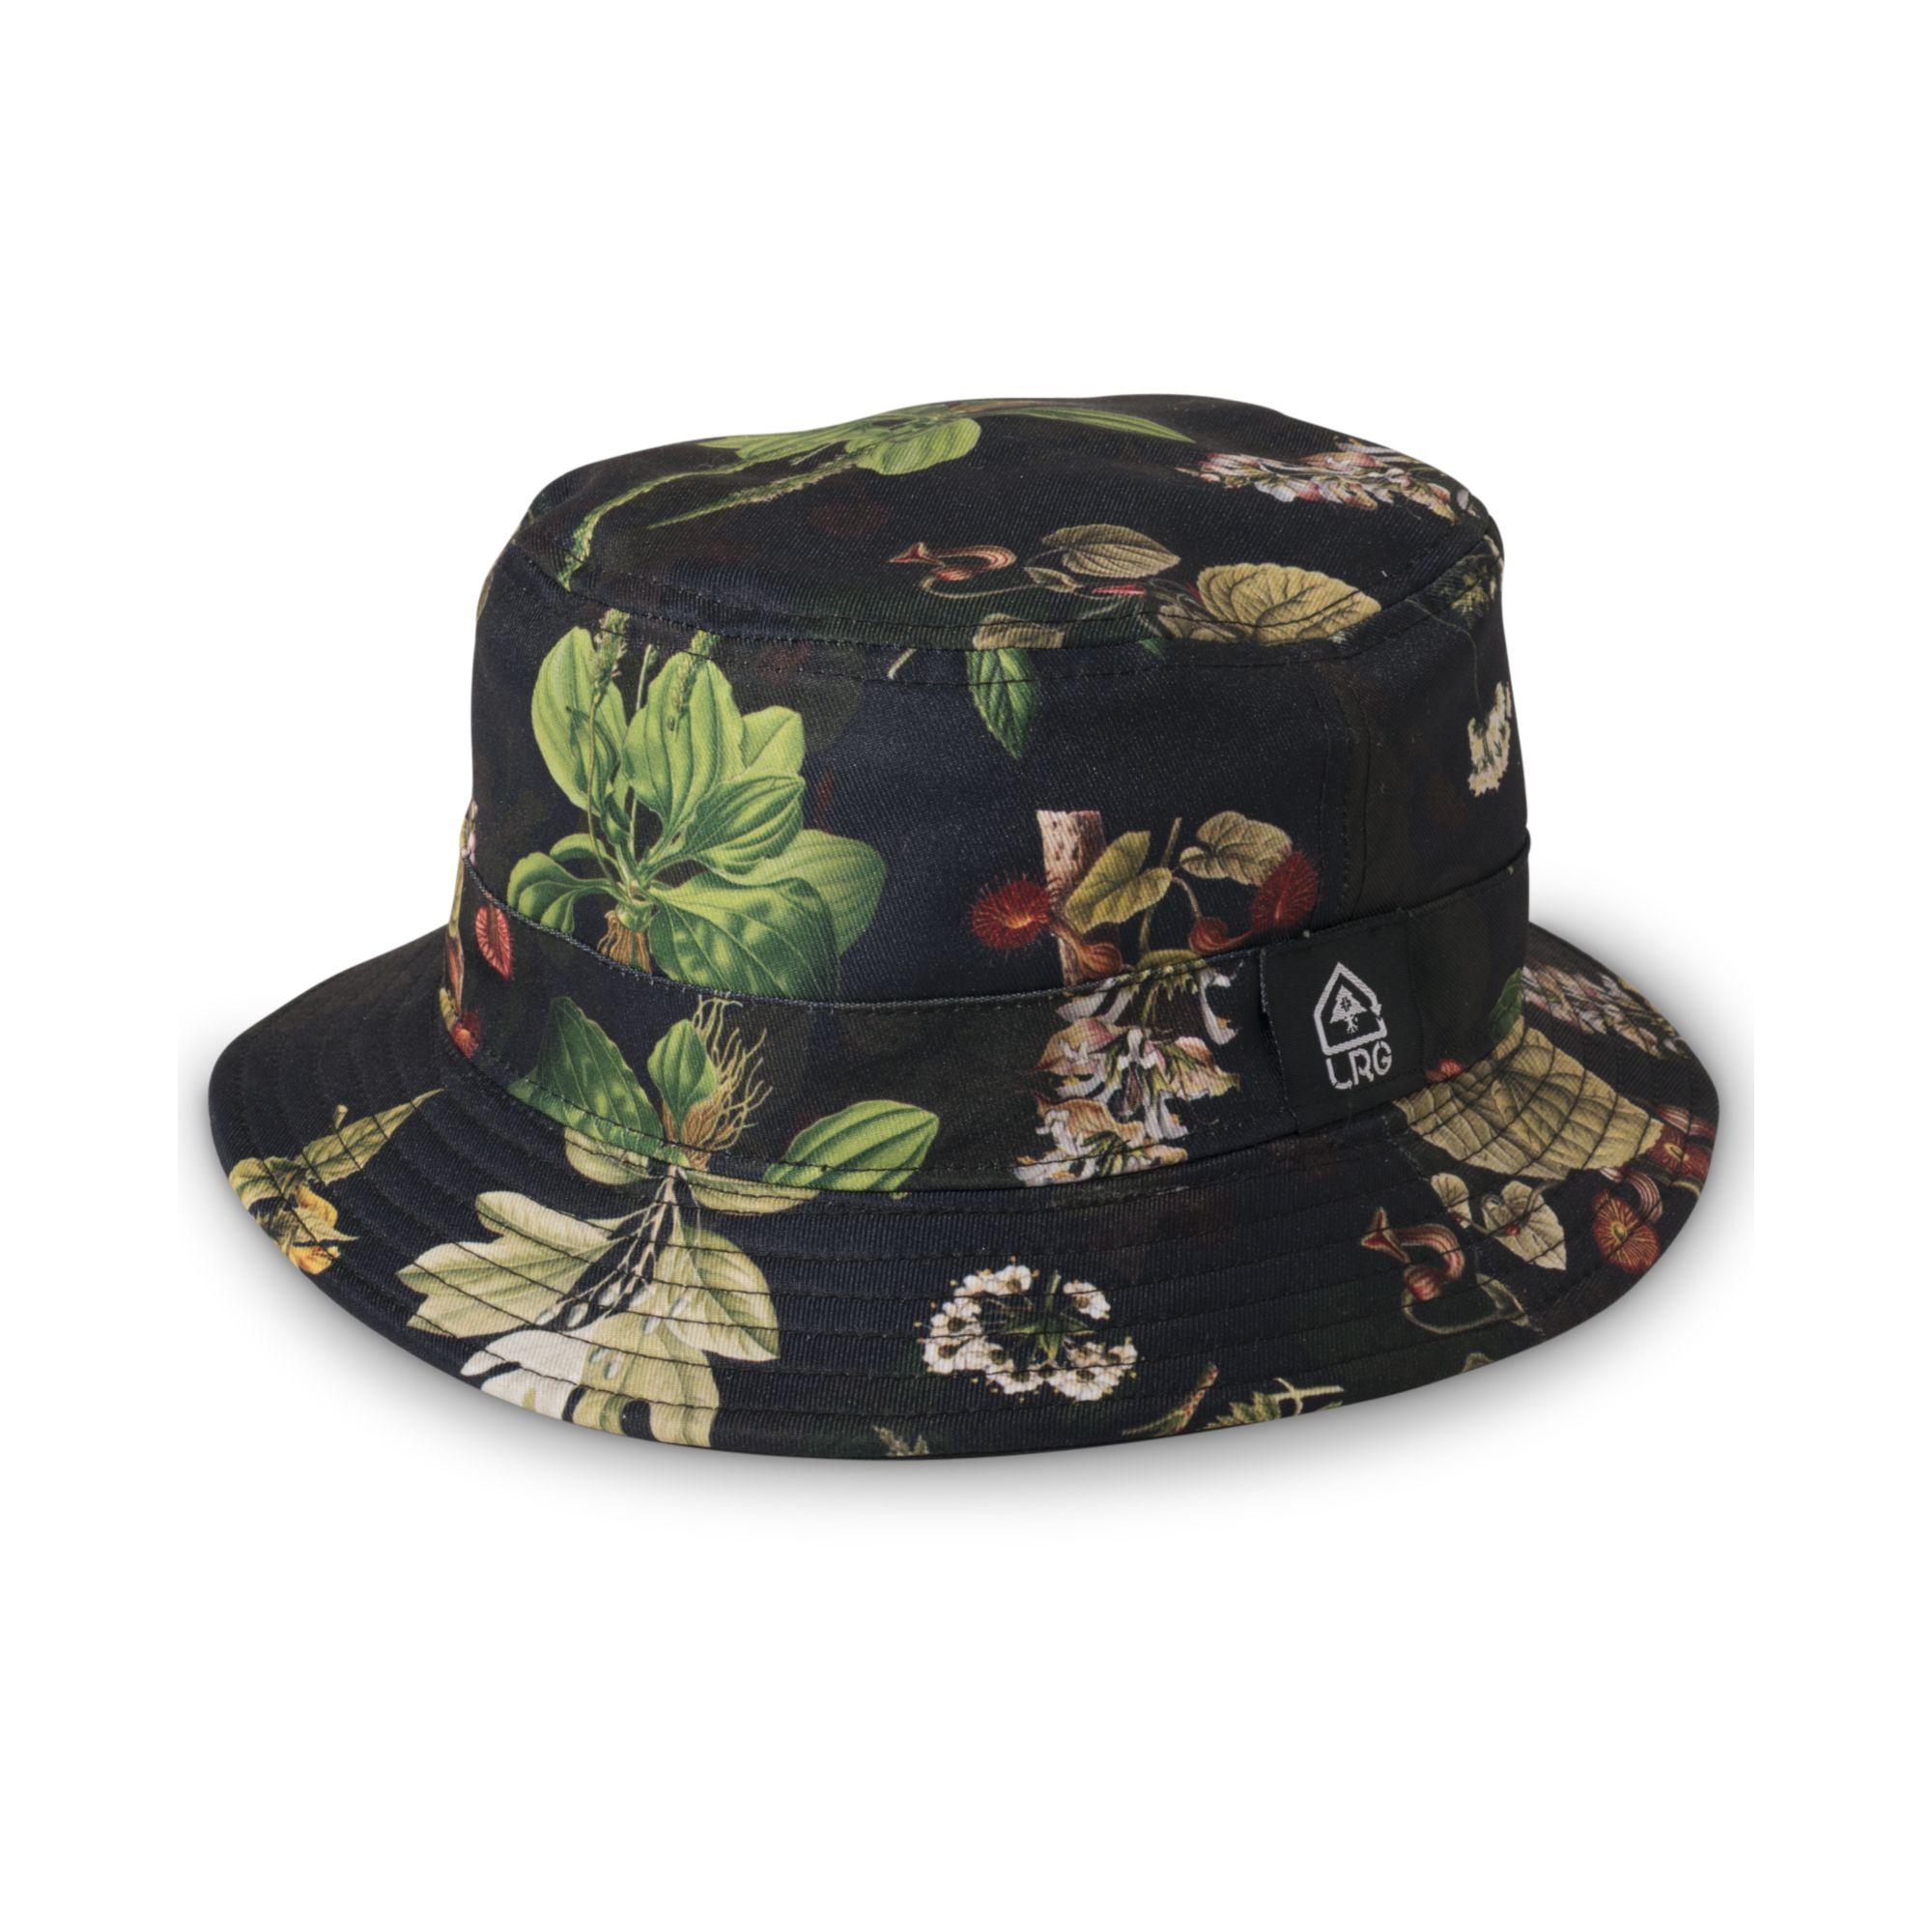 f3ae5803072 Lyst - LRG Floral Print Bucket Hat in Black for Men